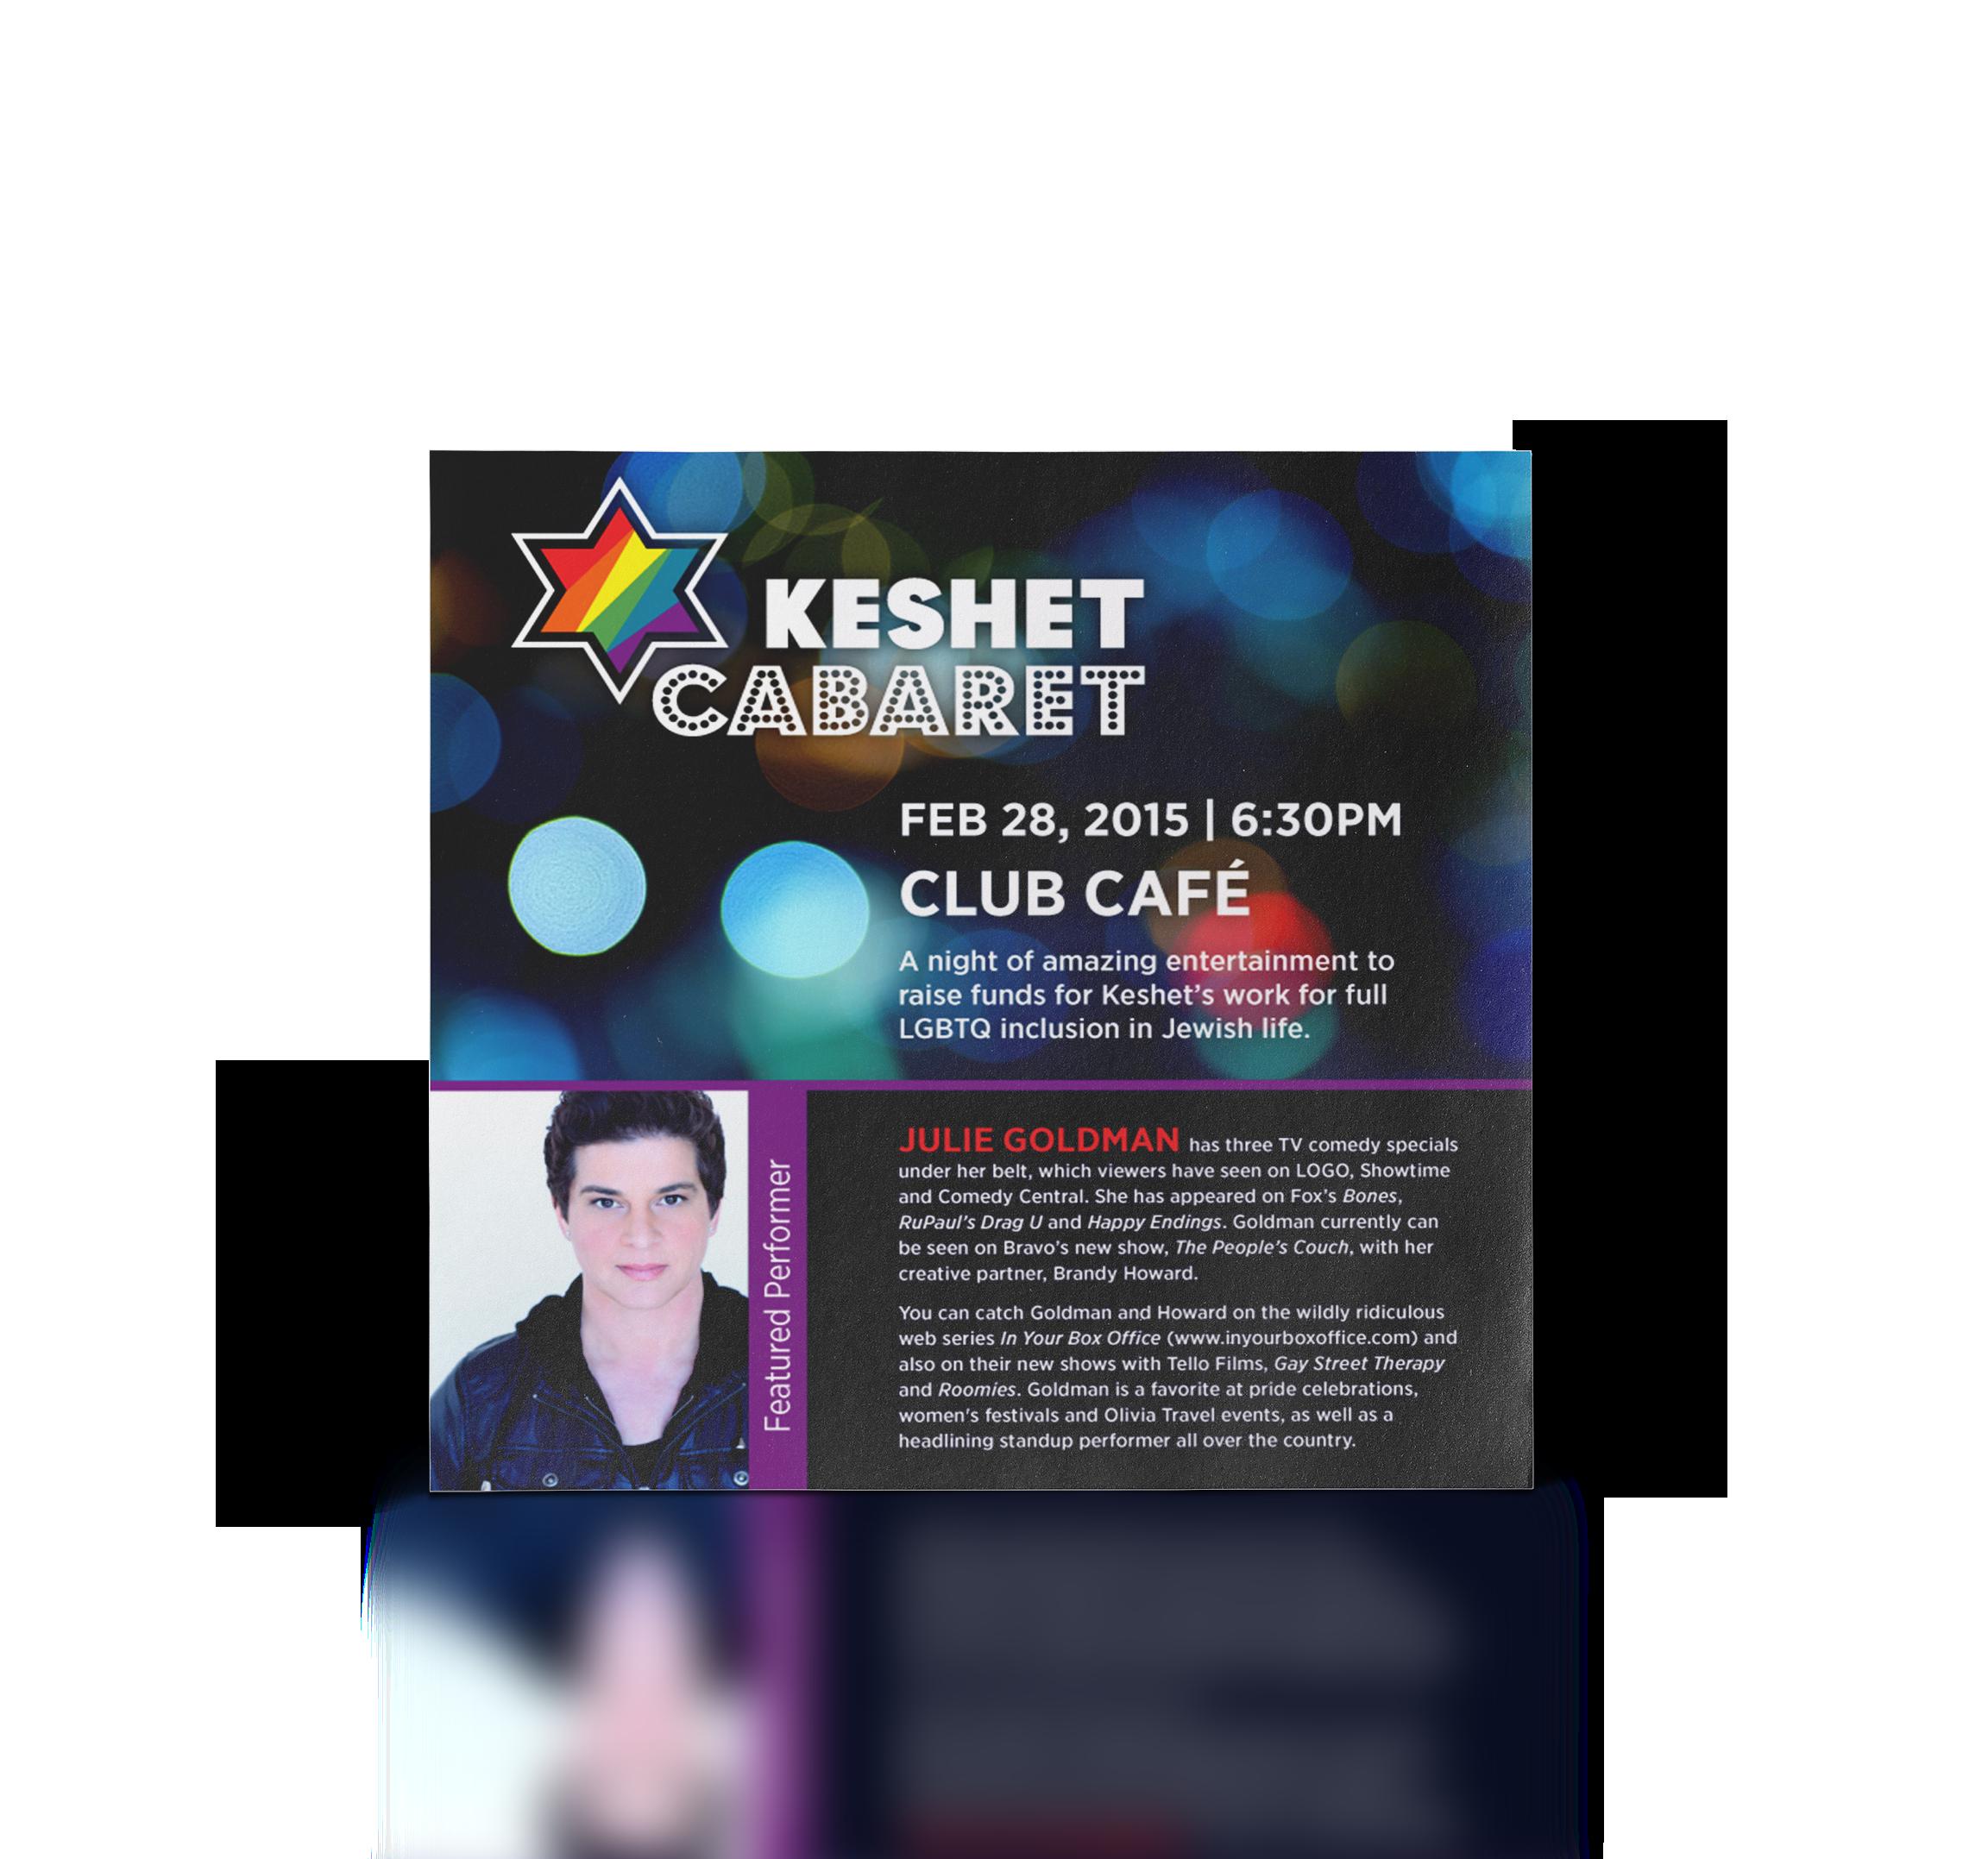 Copy of Postcard advertising a nightclub event